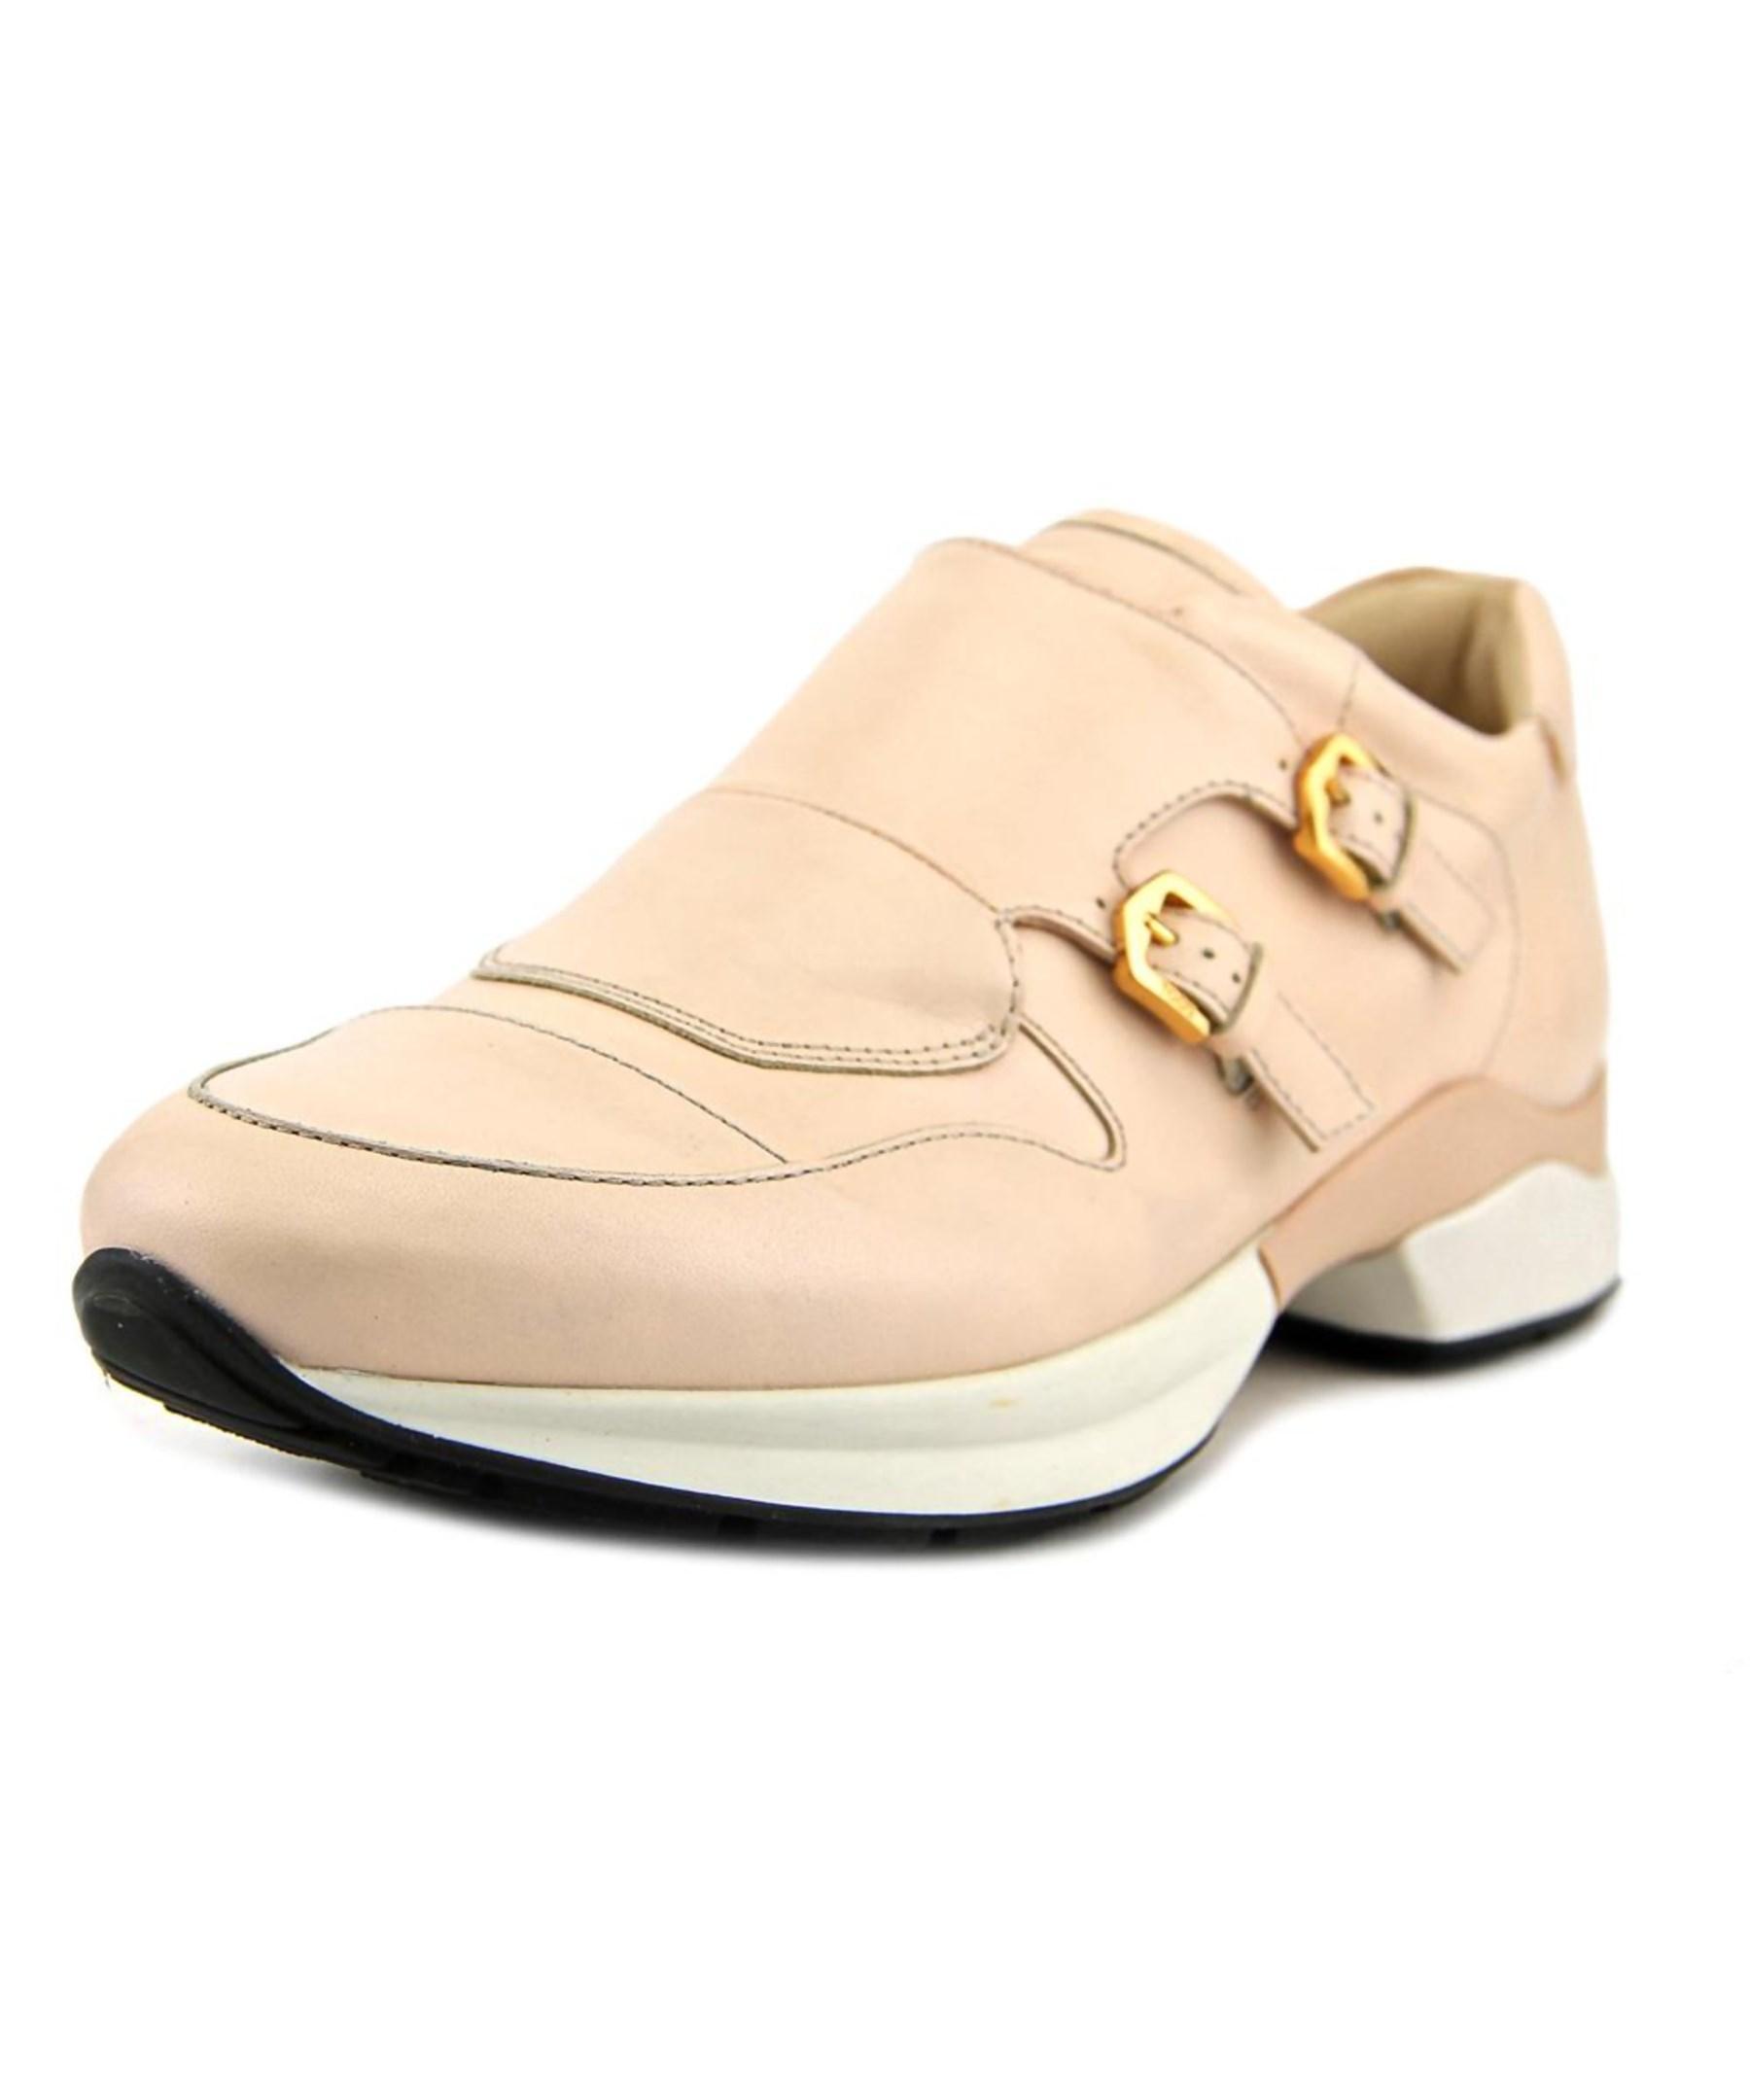 Todu0026#39;s Fondo Sportivo Uu Allacciata Women Leather Pink Fashion Sneakers In Pink | Lyst